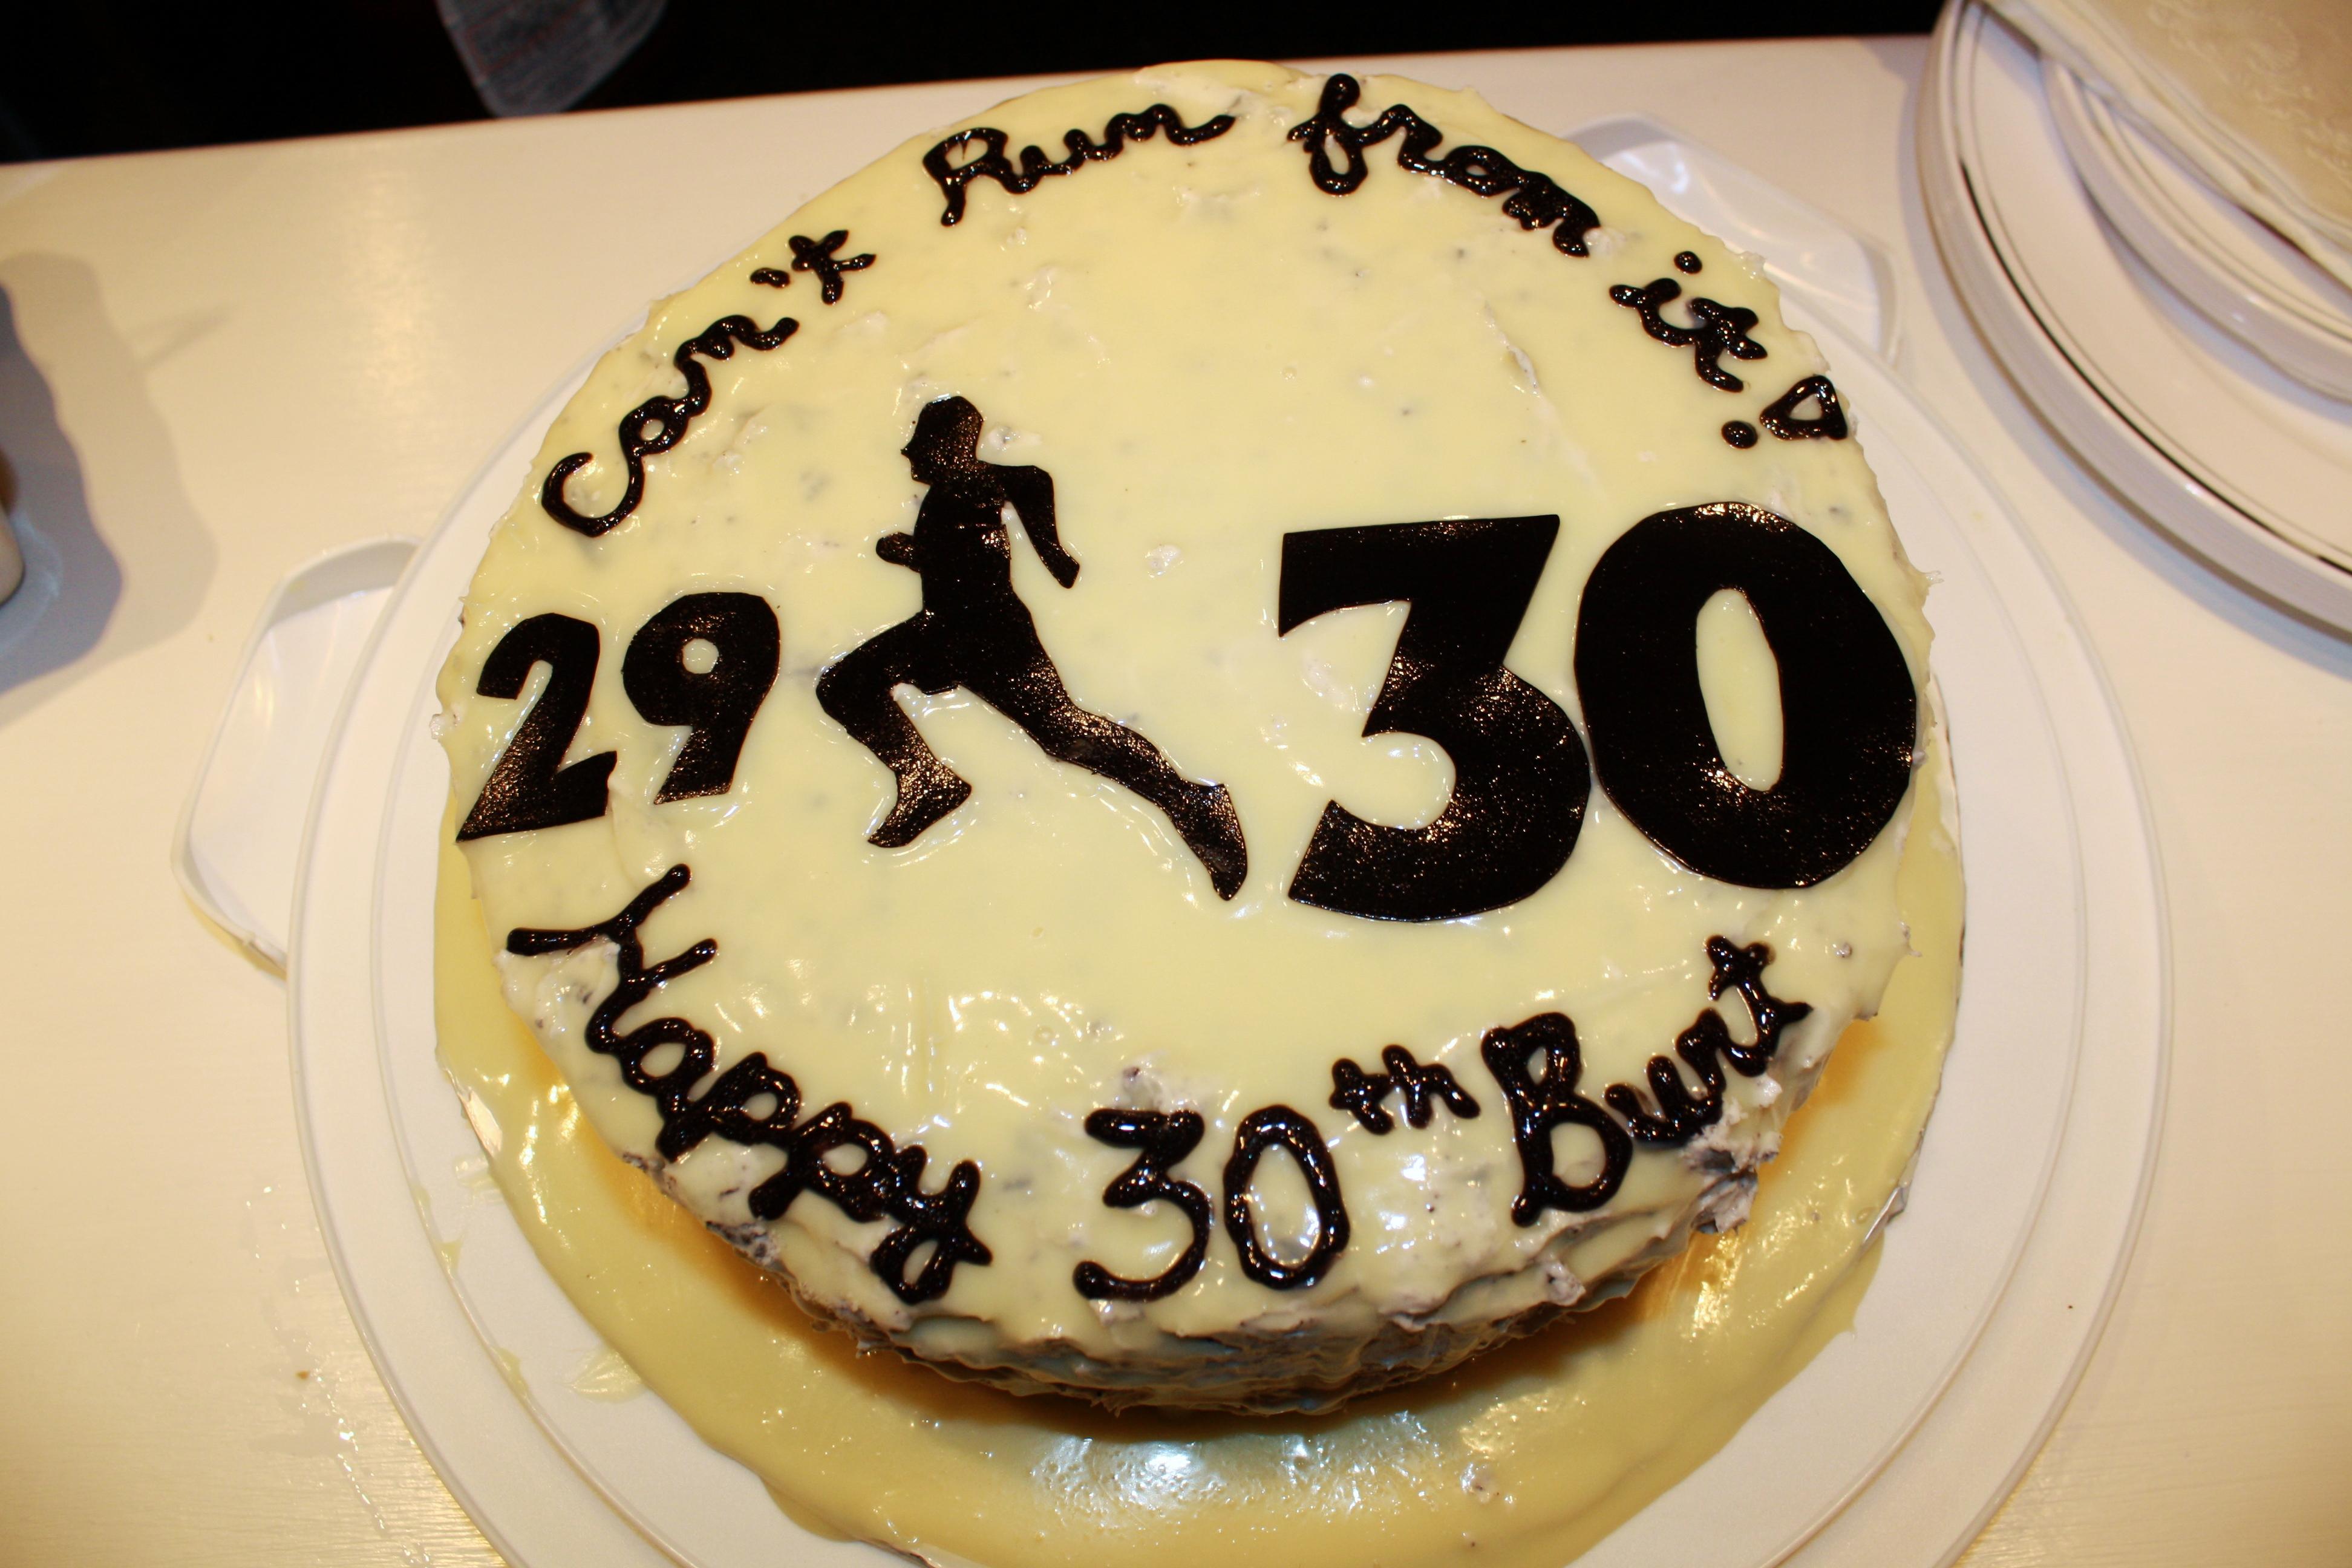 30th birthday cake ideas for him